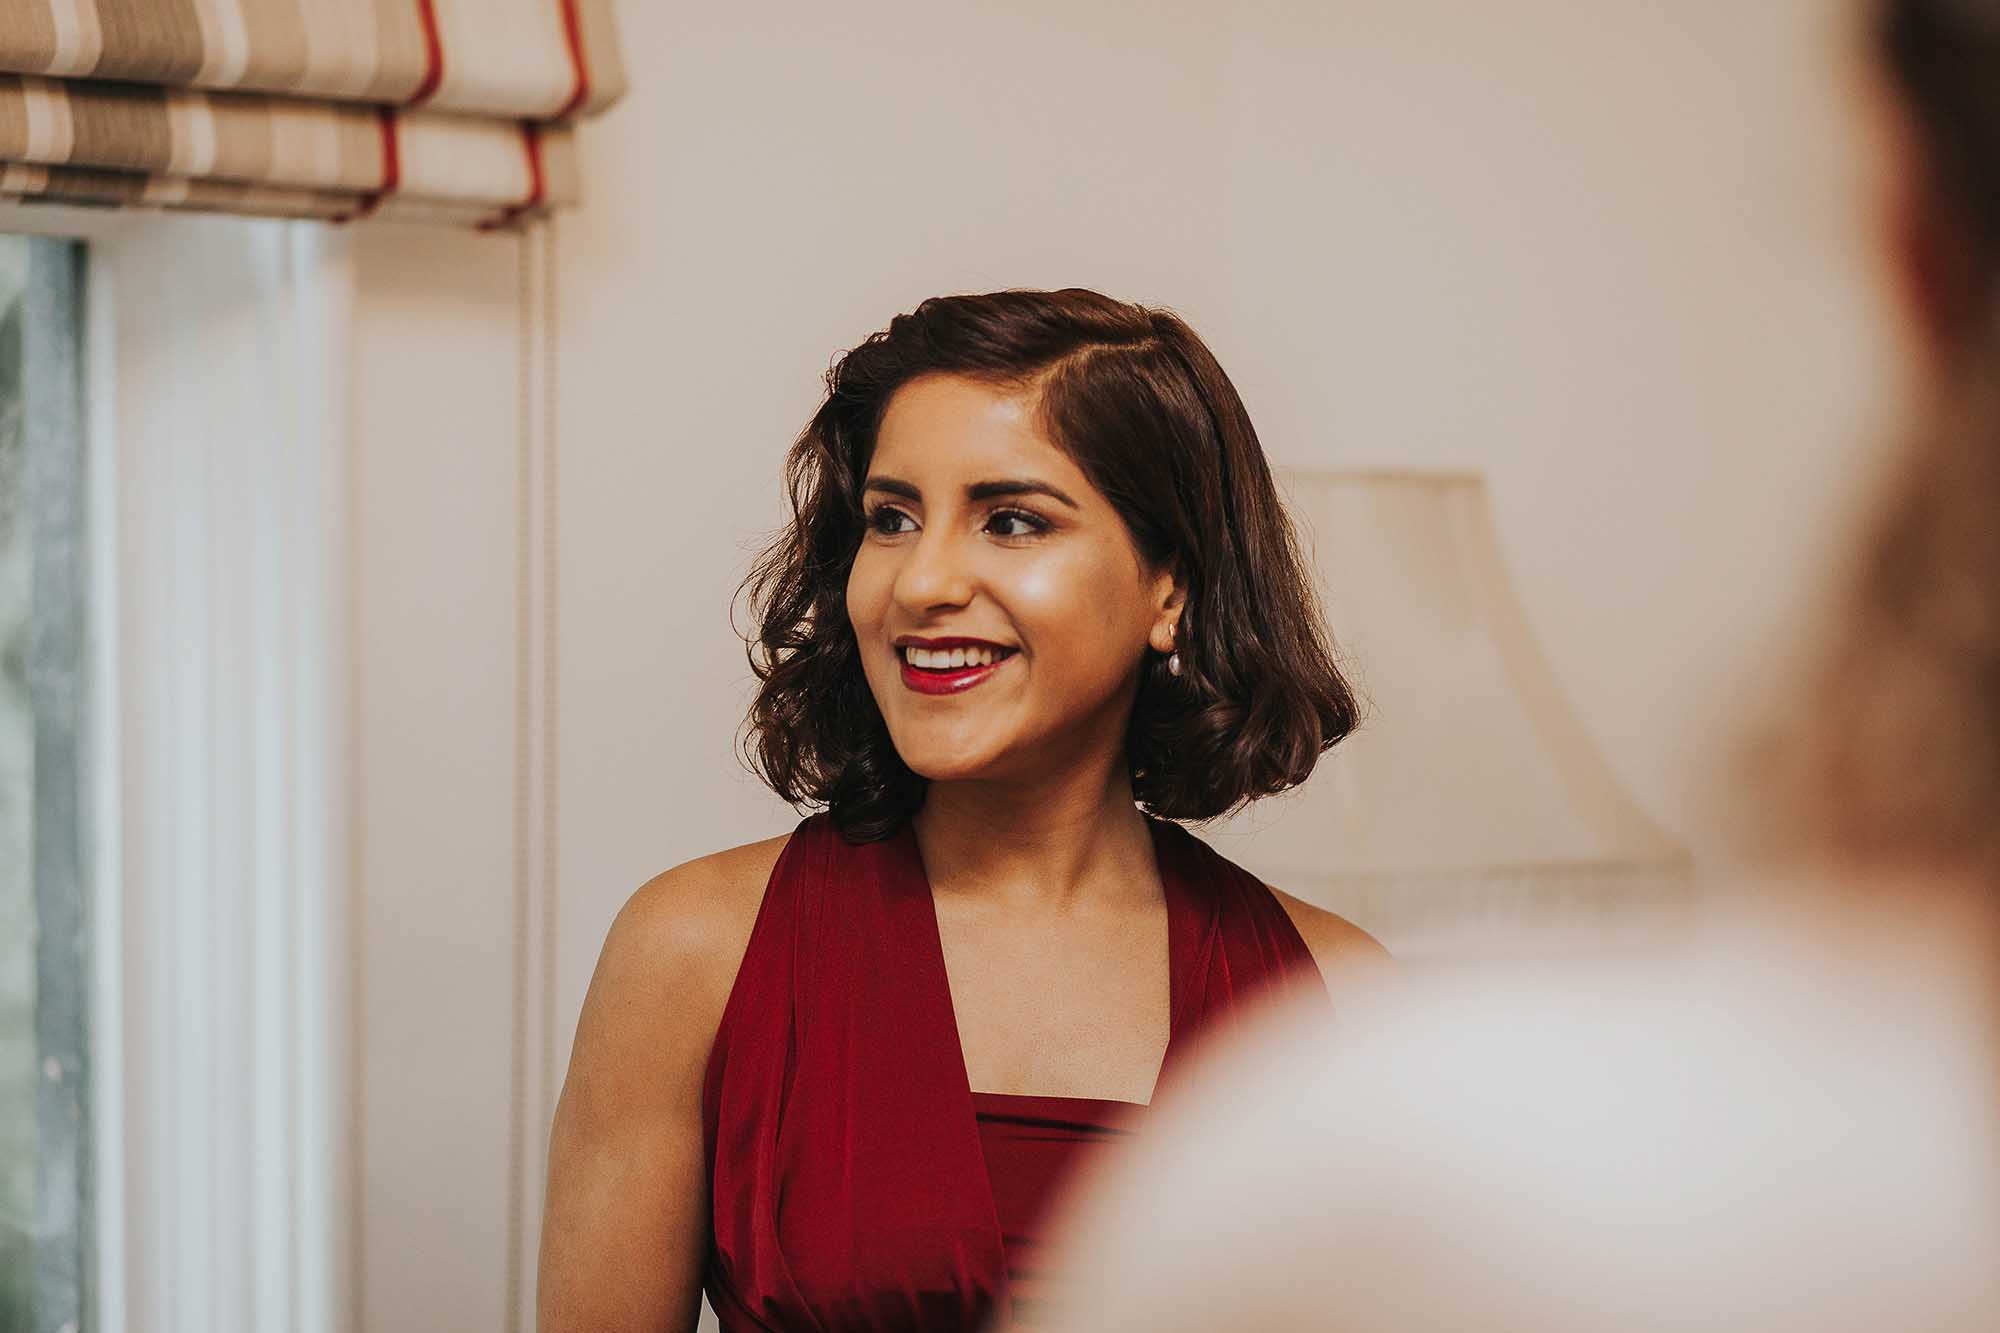 Samlesbury Hall bridesmaid